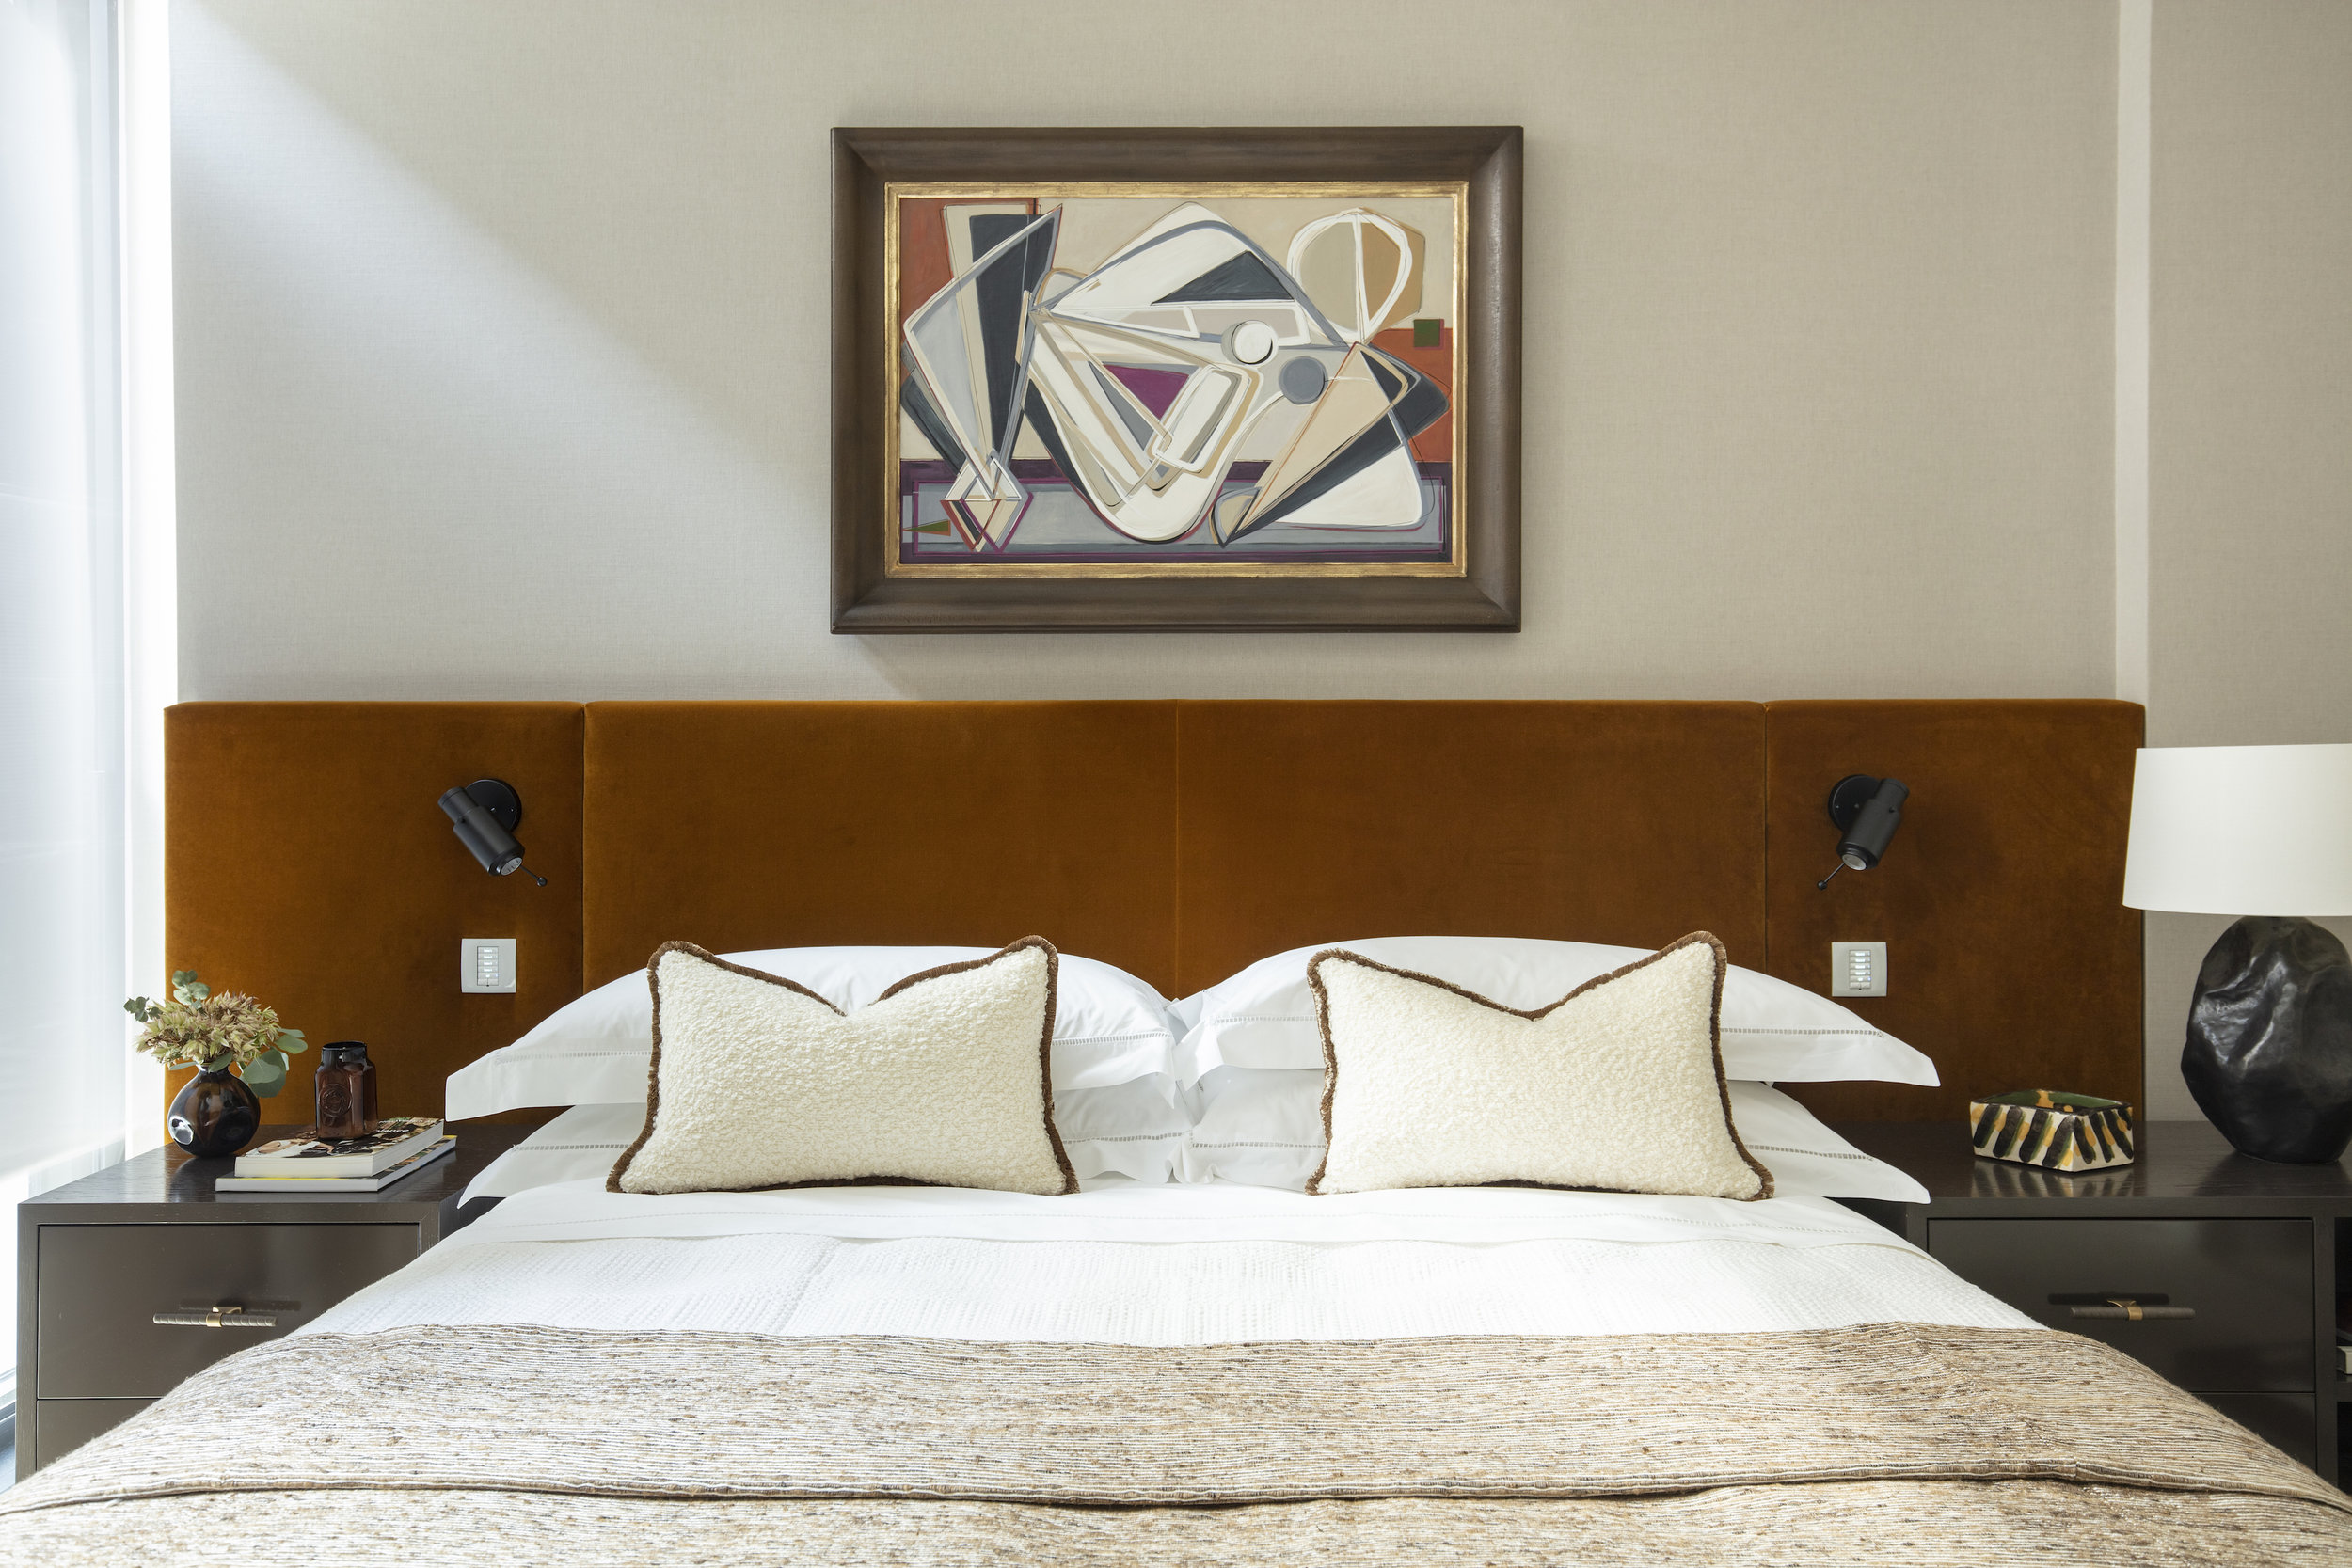 Burlington Gate | London   Master Bedroom - Oil Painting on Canvas      Interior Design & Architecture: Hudson & Mercer